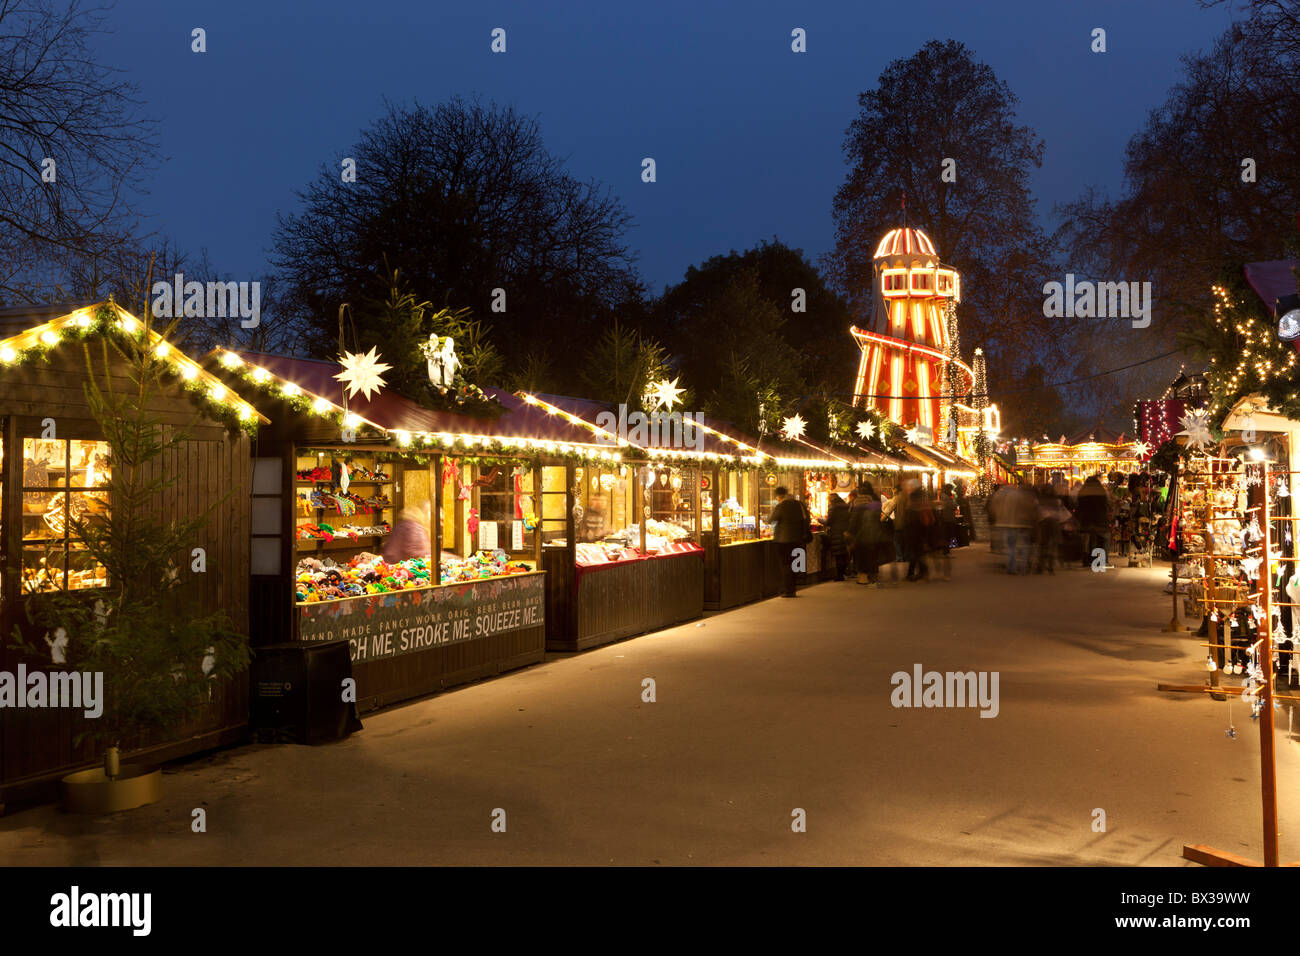 Hyde Park Winter Wonderland Christmas stalls Stock Photo, Royalty ...